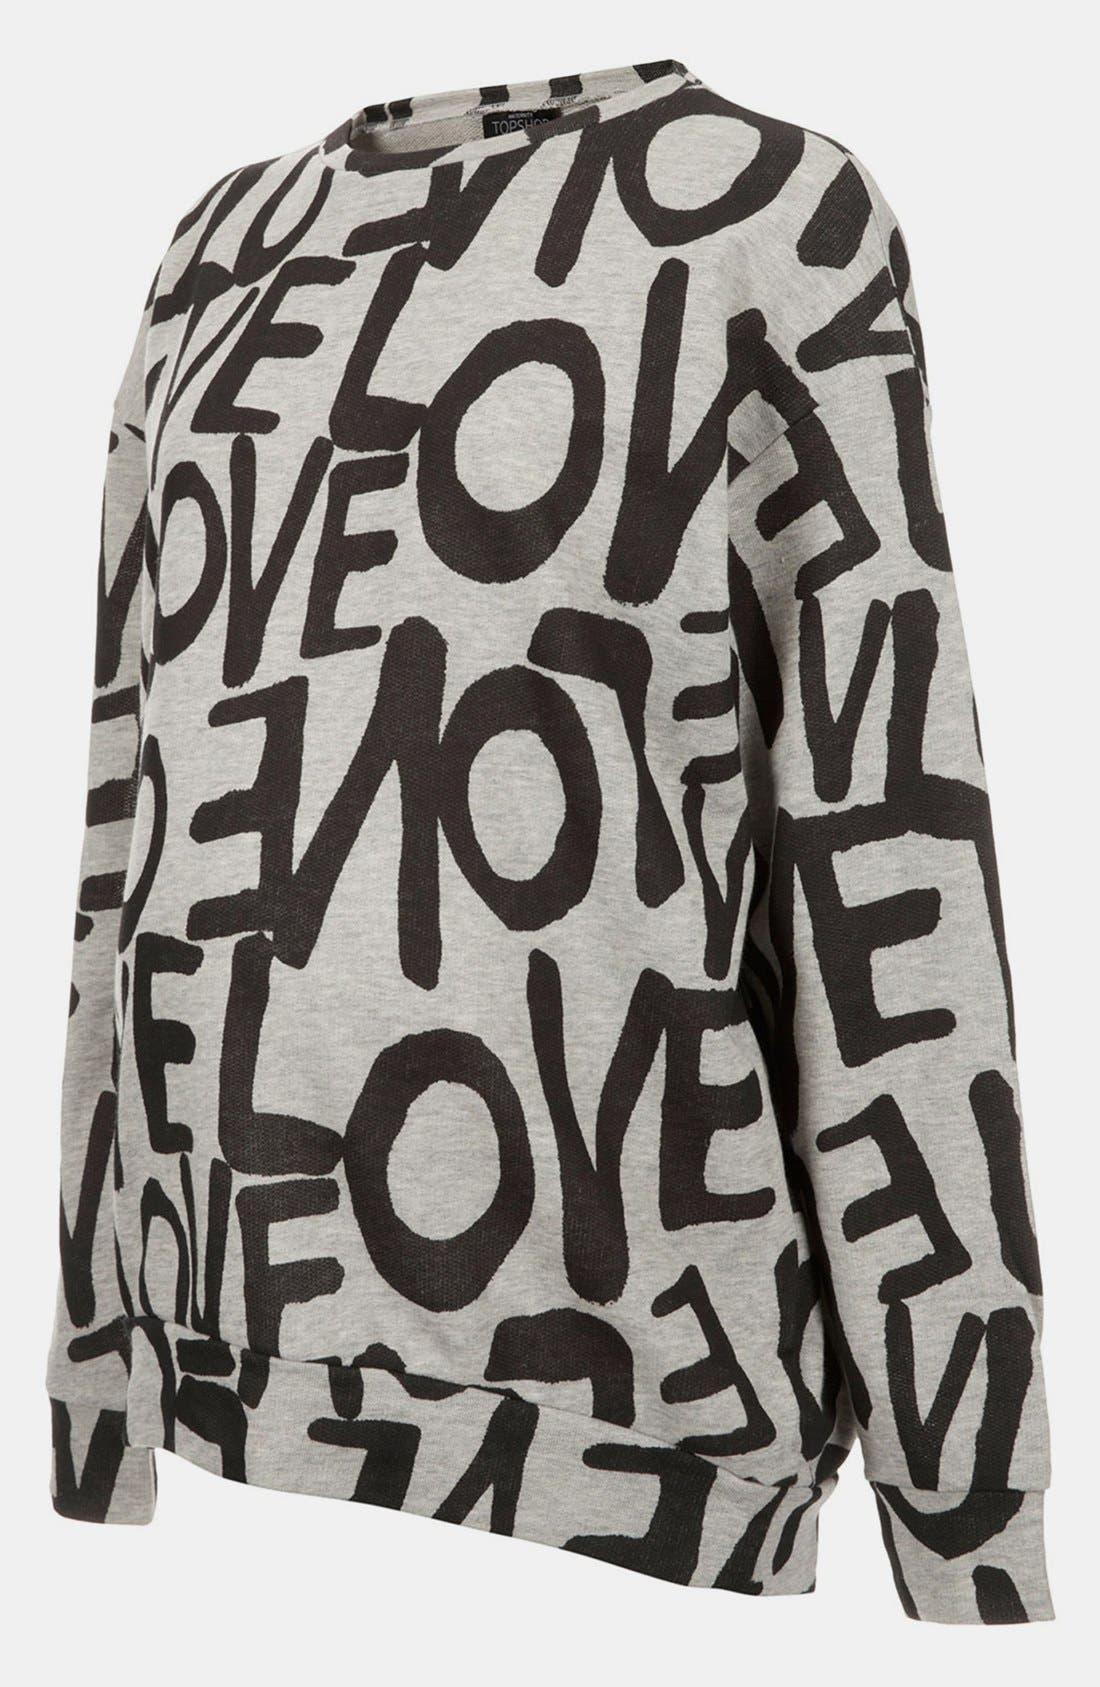 Main Image - Topshop 'Love' Maternity Sweatshirt